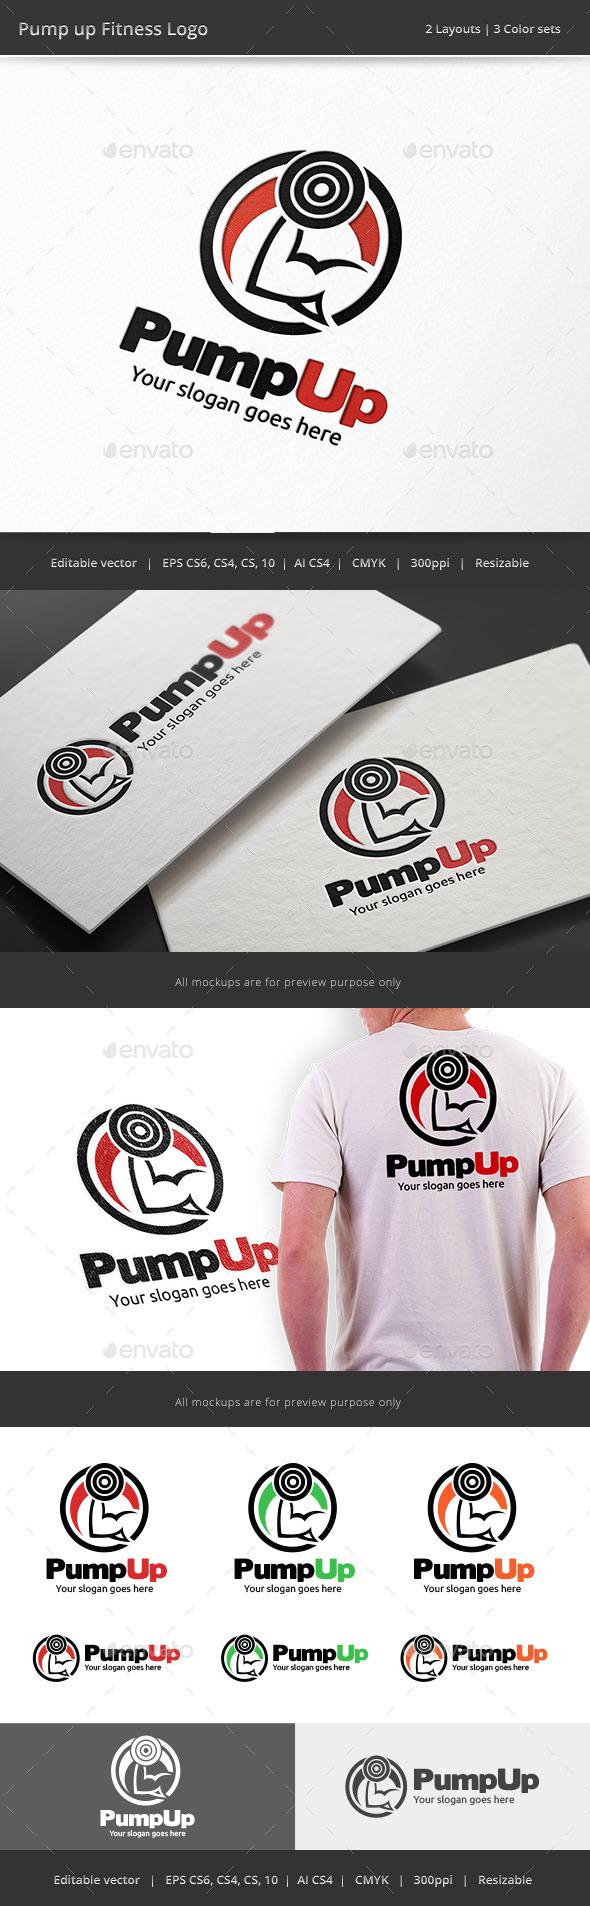 Pump Up Fitness Logo